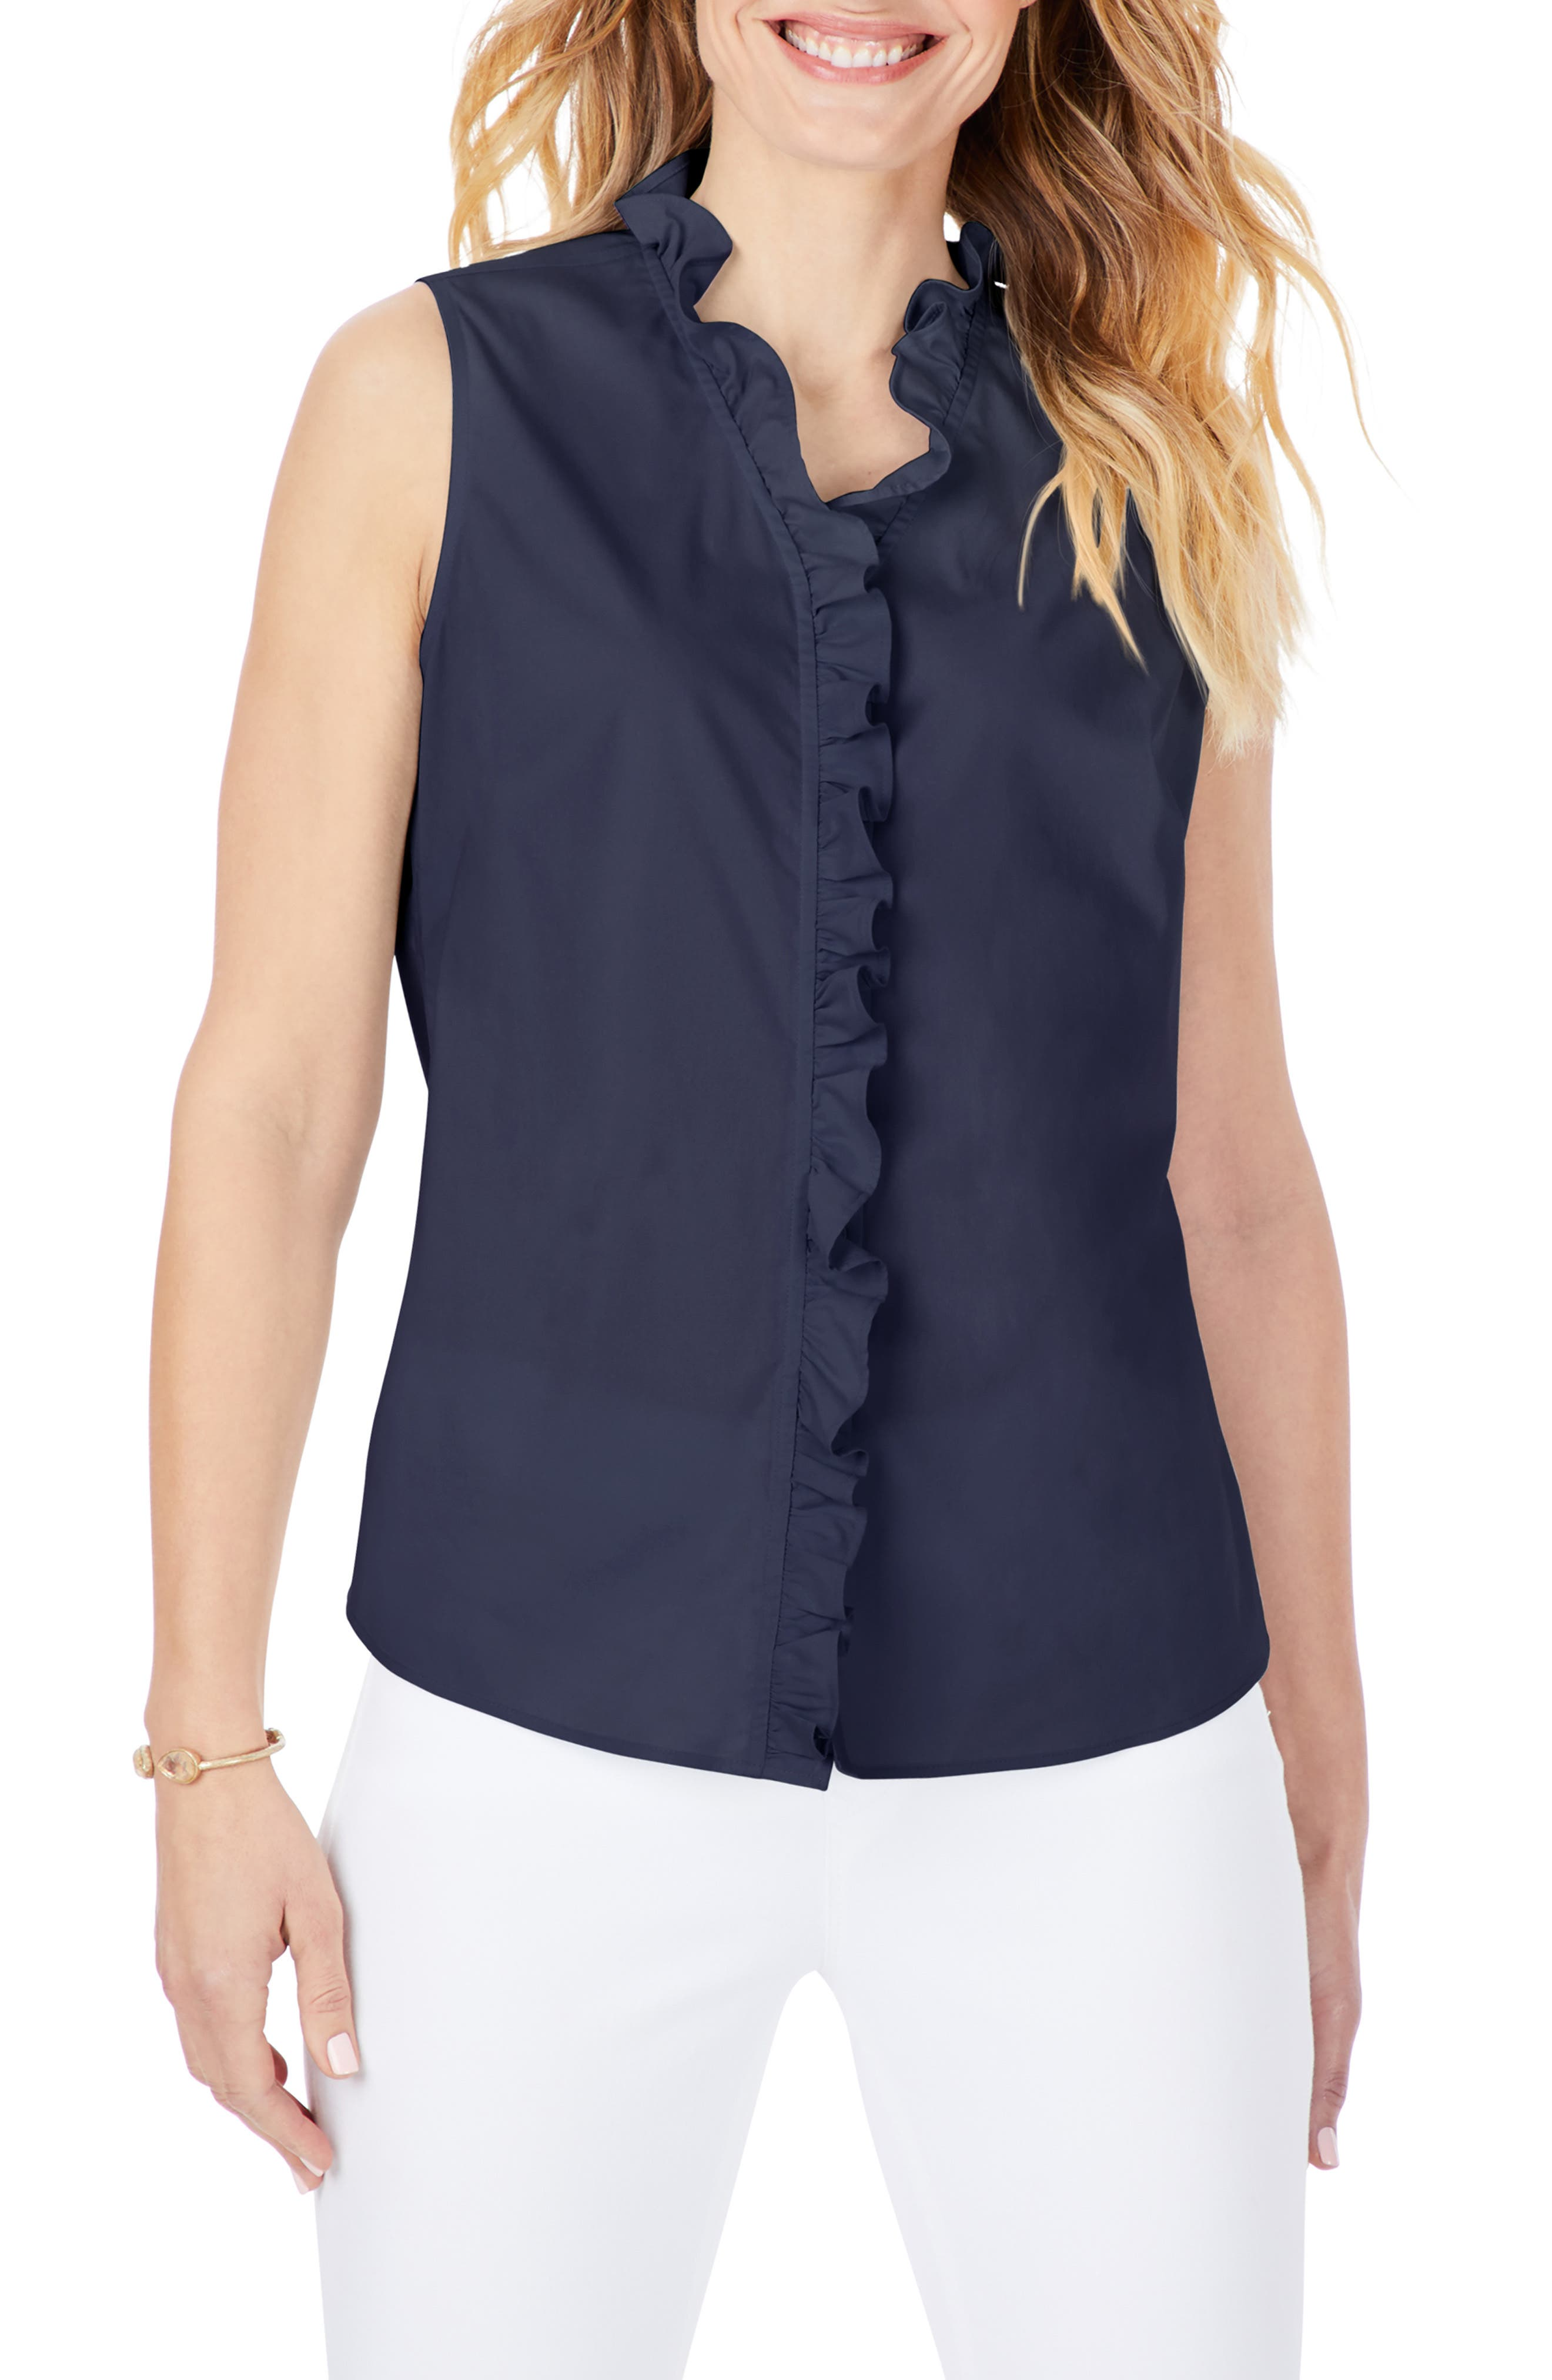 Gwen Ruffle Non-Iron Stretch Button-Up Sleeveless Shirt